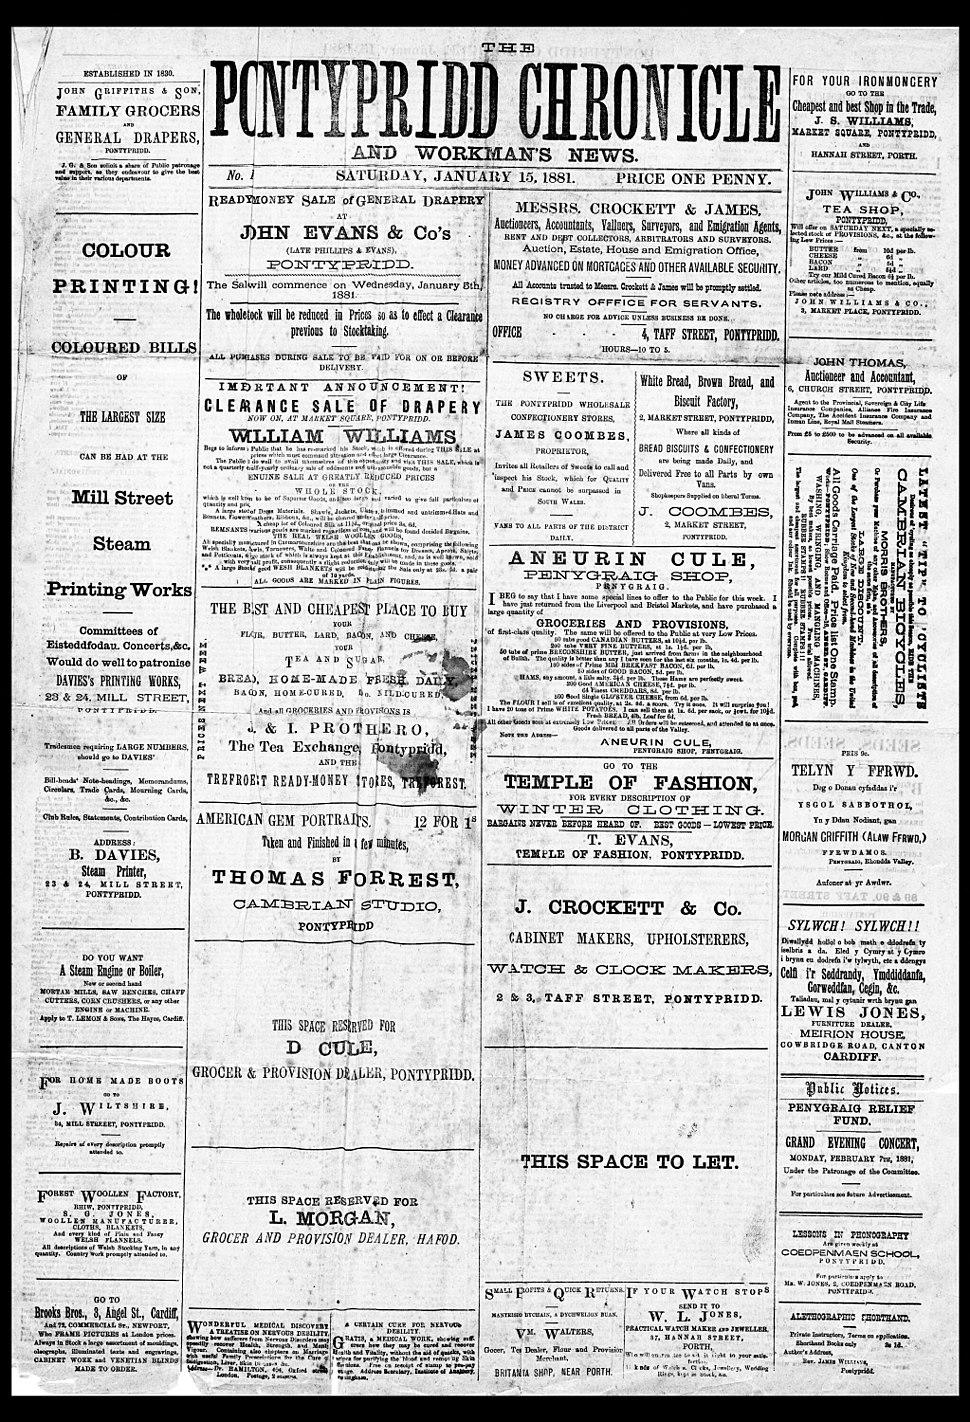 The Pontypridd Chronicle Jan 15 1881